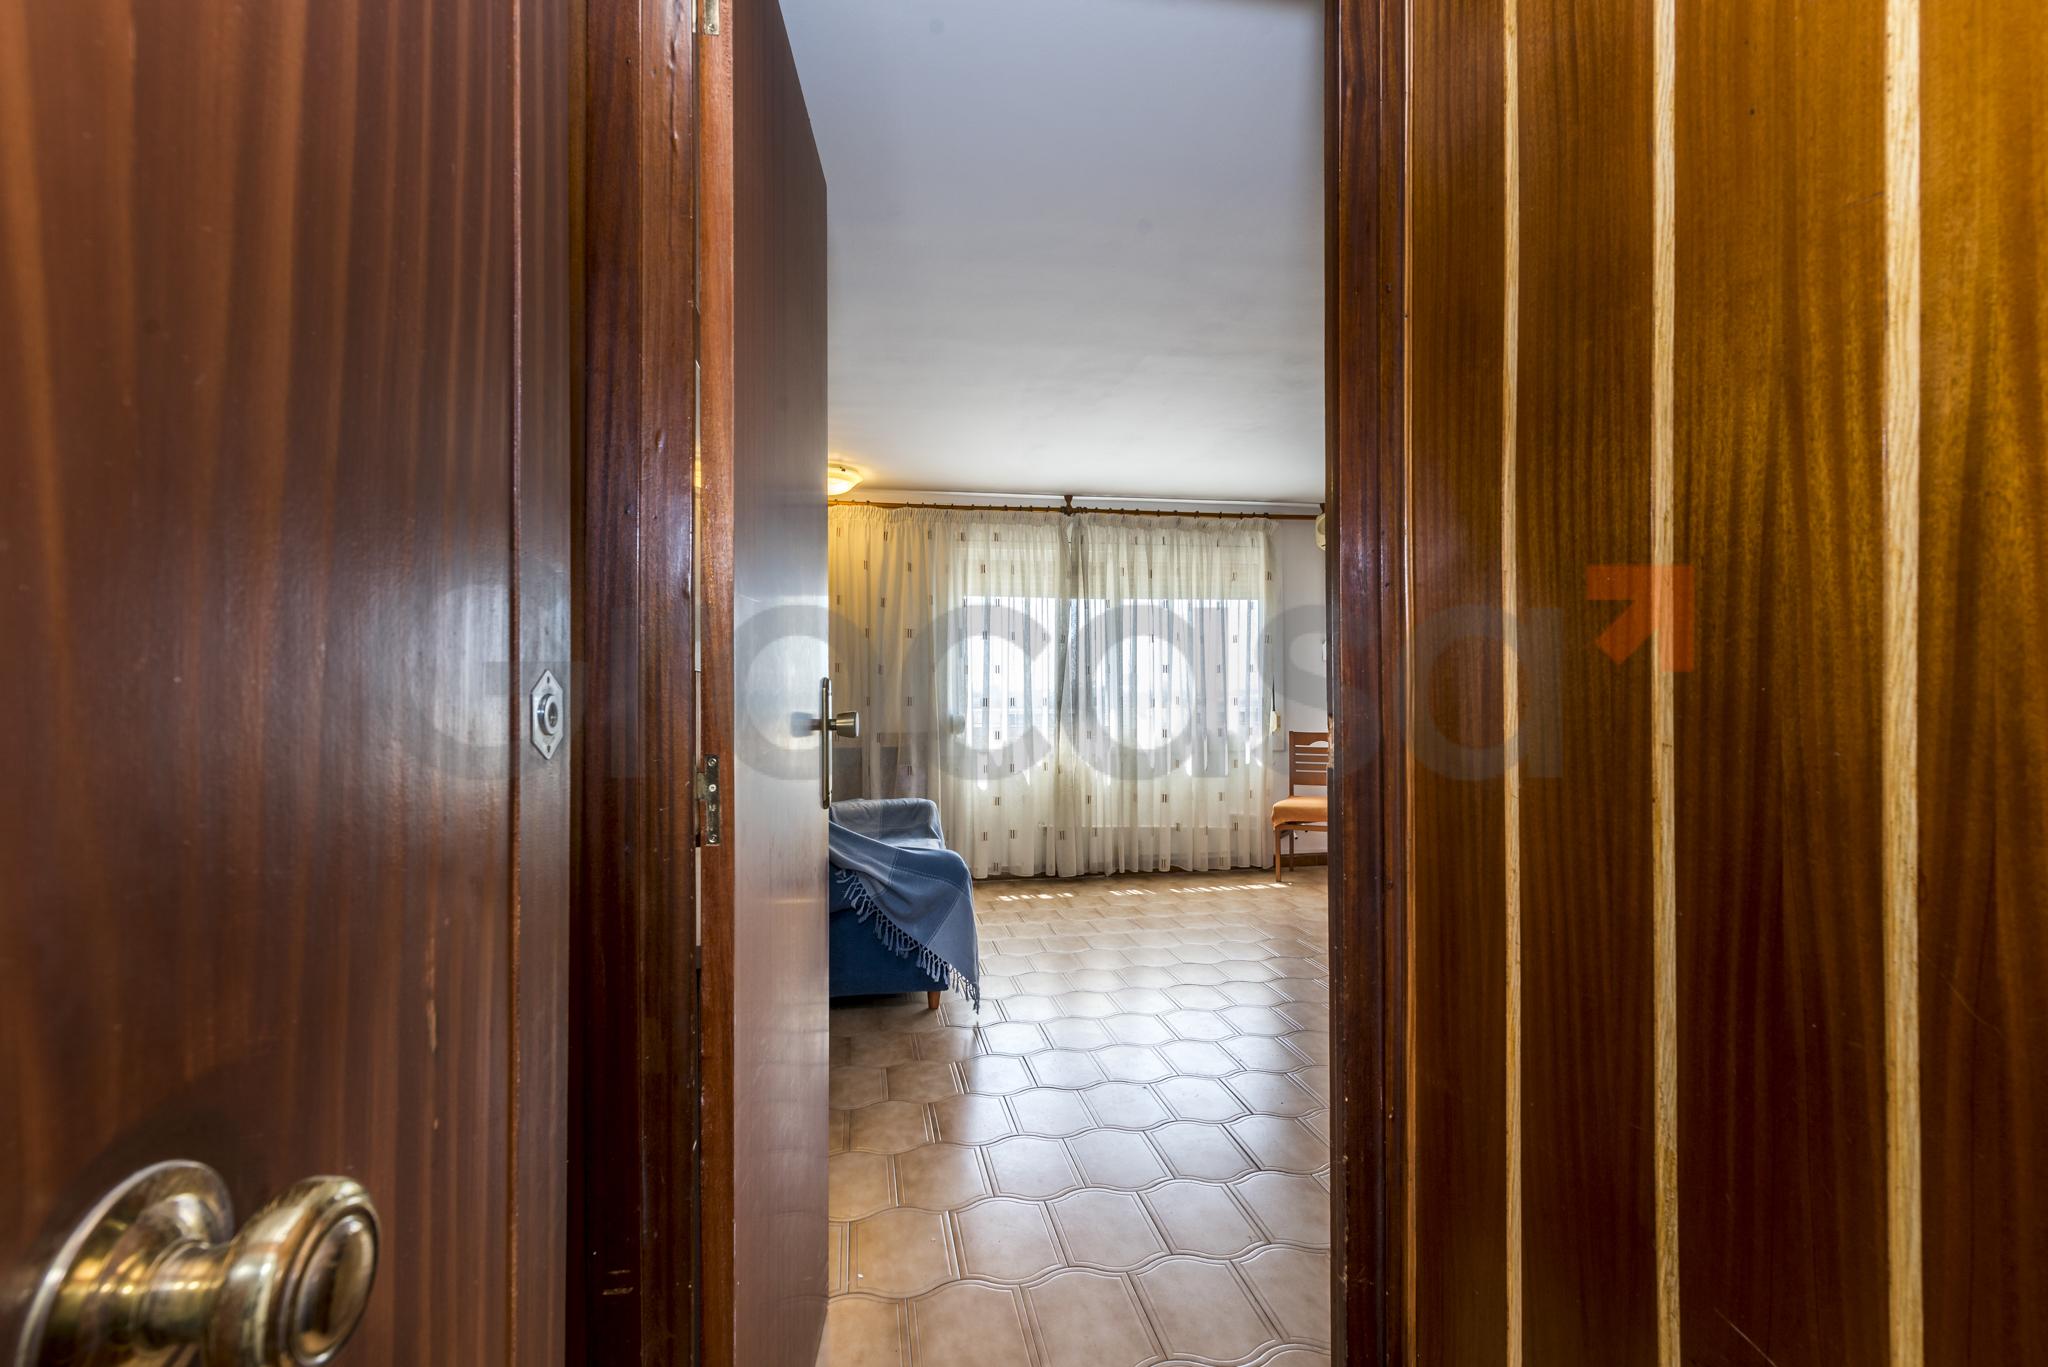 Piso en Bellvitge en L'Hospitalet de llobregat en Venta por 159.000€